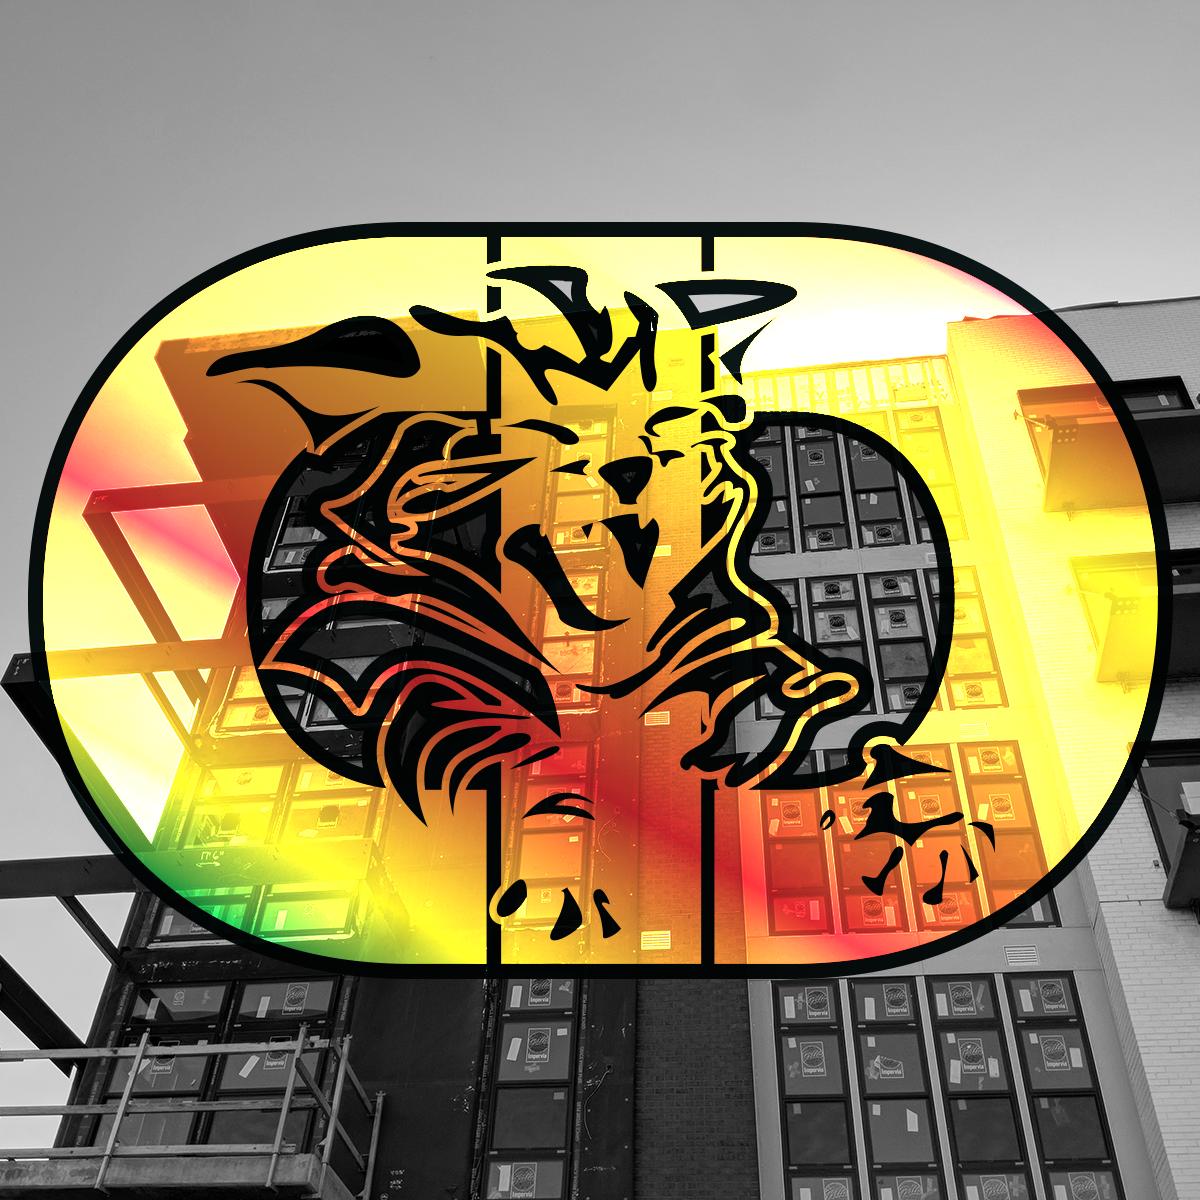 Cat's Imaging & Design Digital Design Image